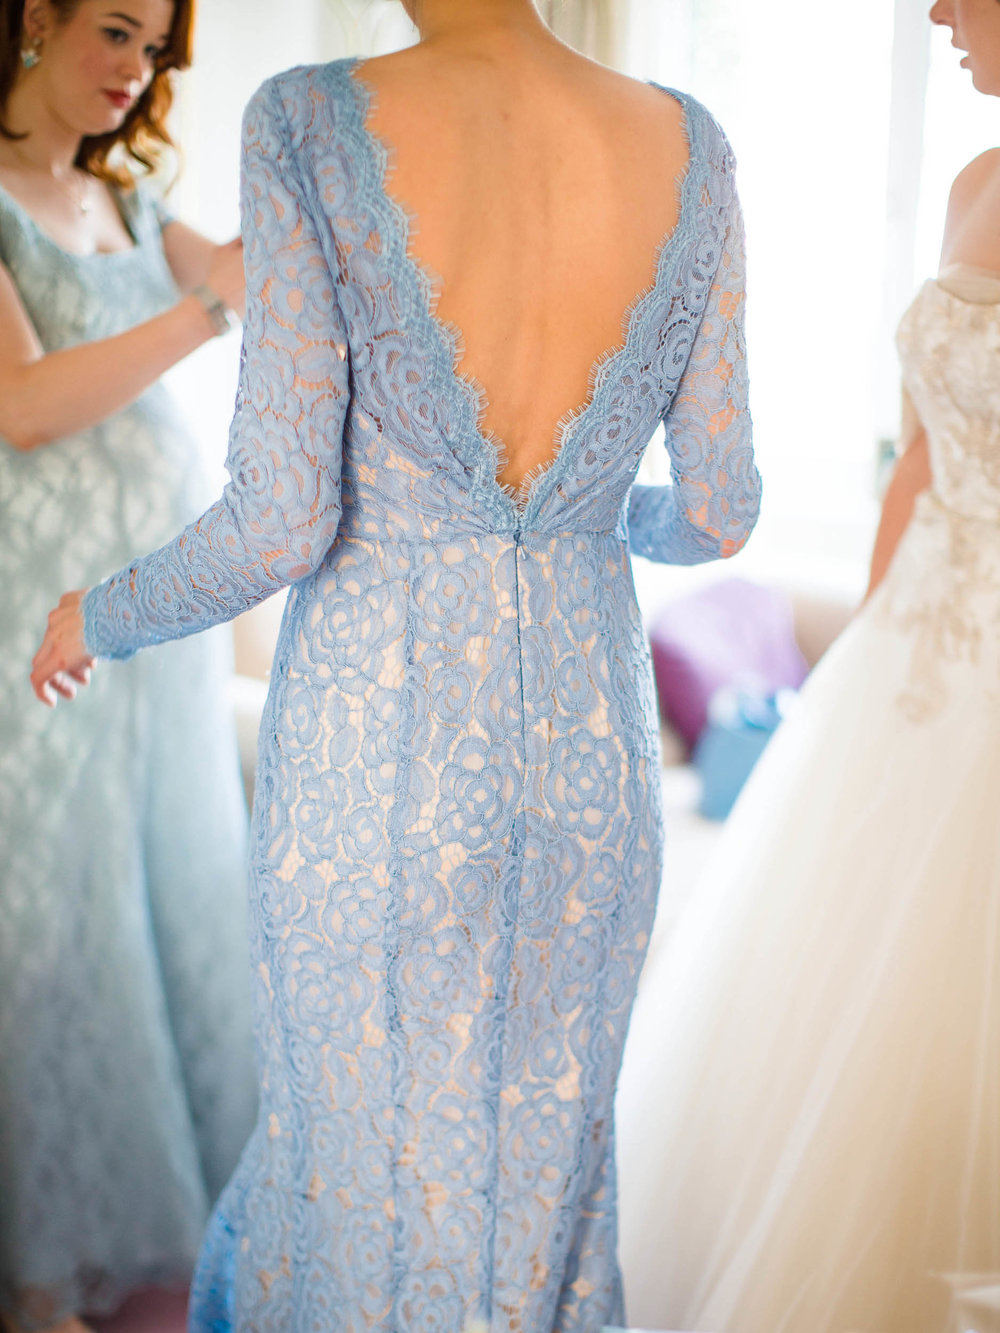 Amy O'Boyle Photography- Destination & UK Fine Art Film Wedding Photographer- Stoneleigh Abbey Wedding-29.jpg